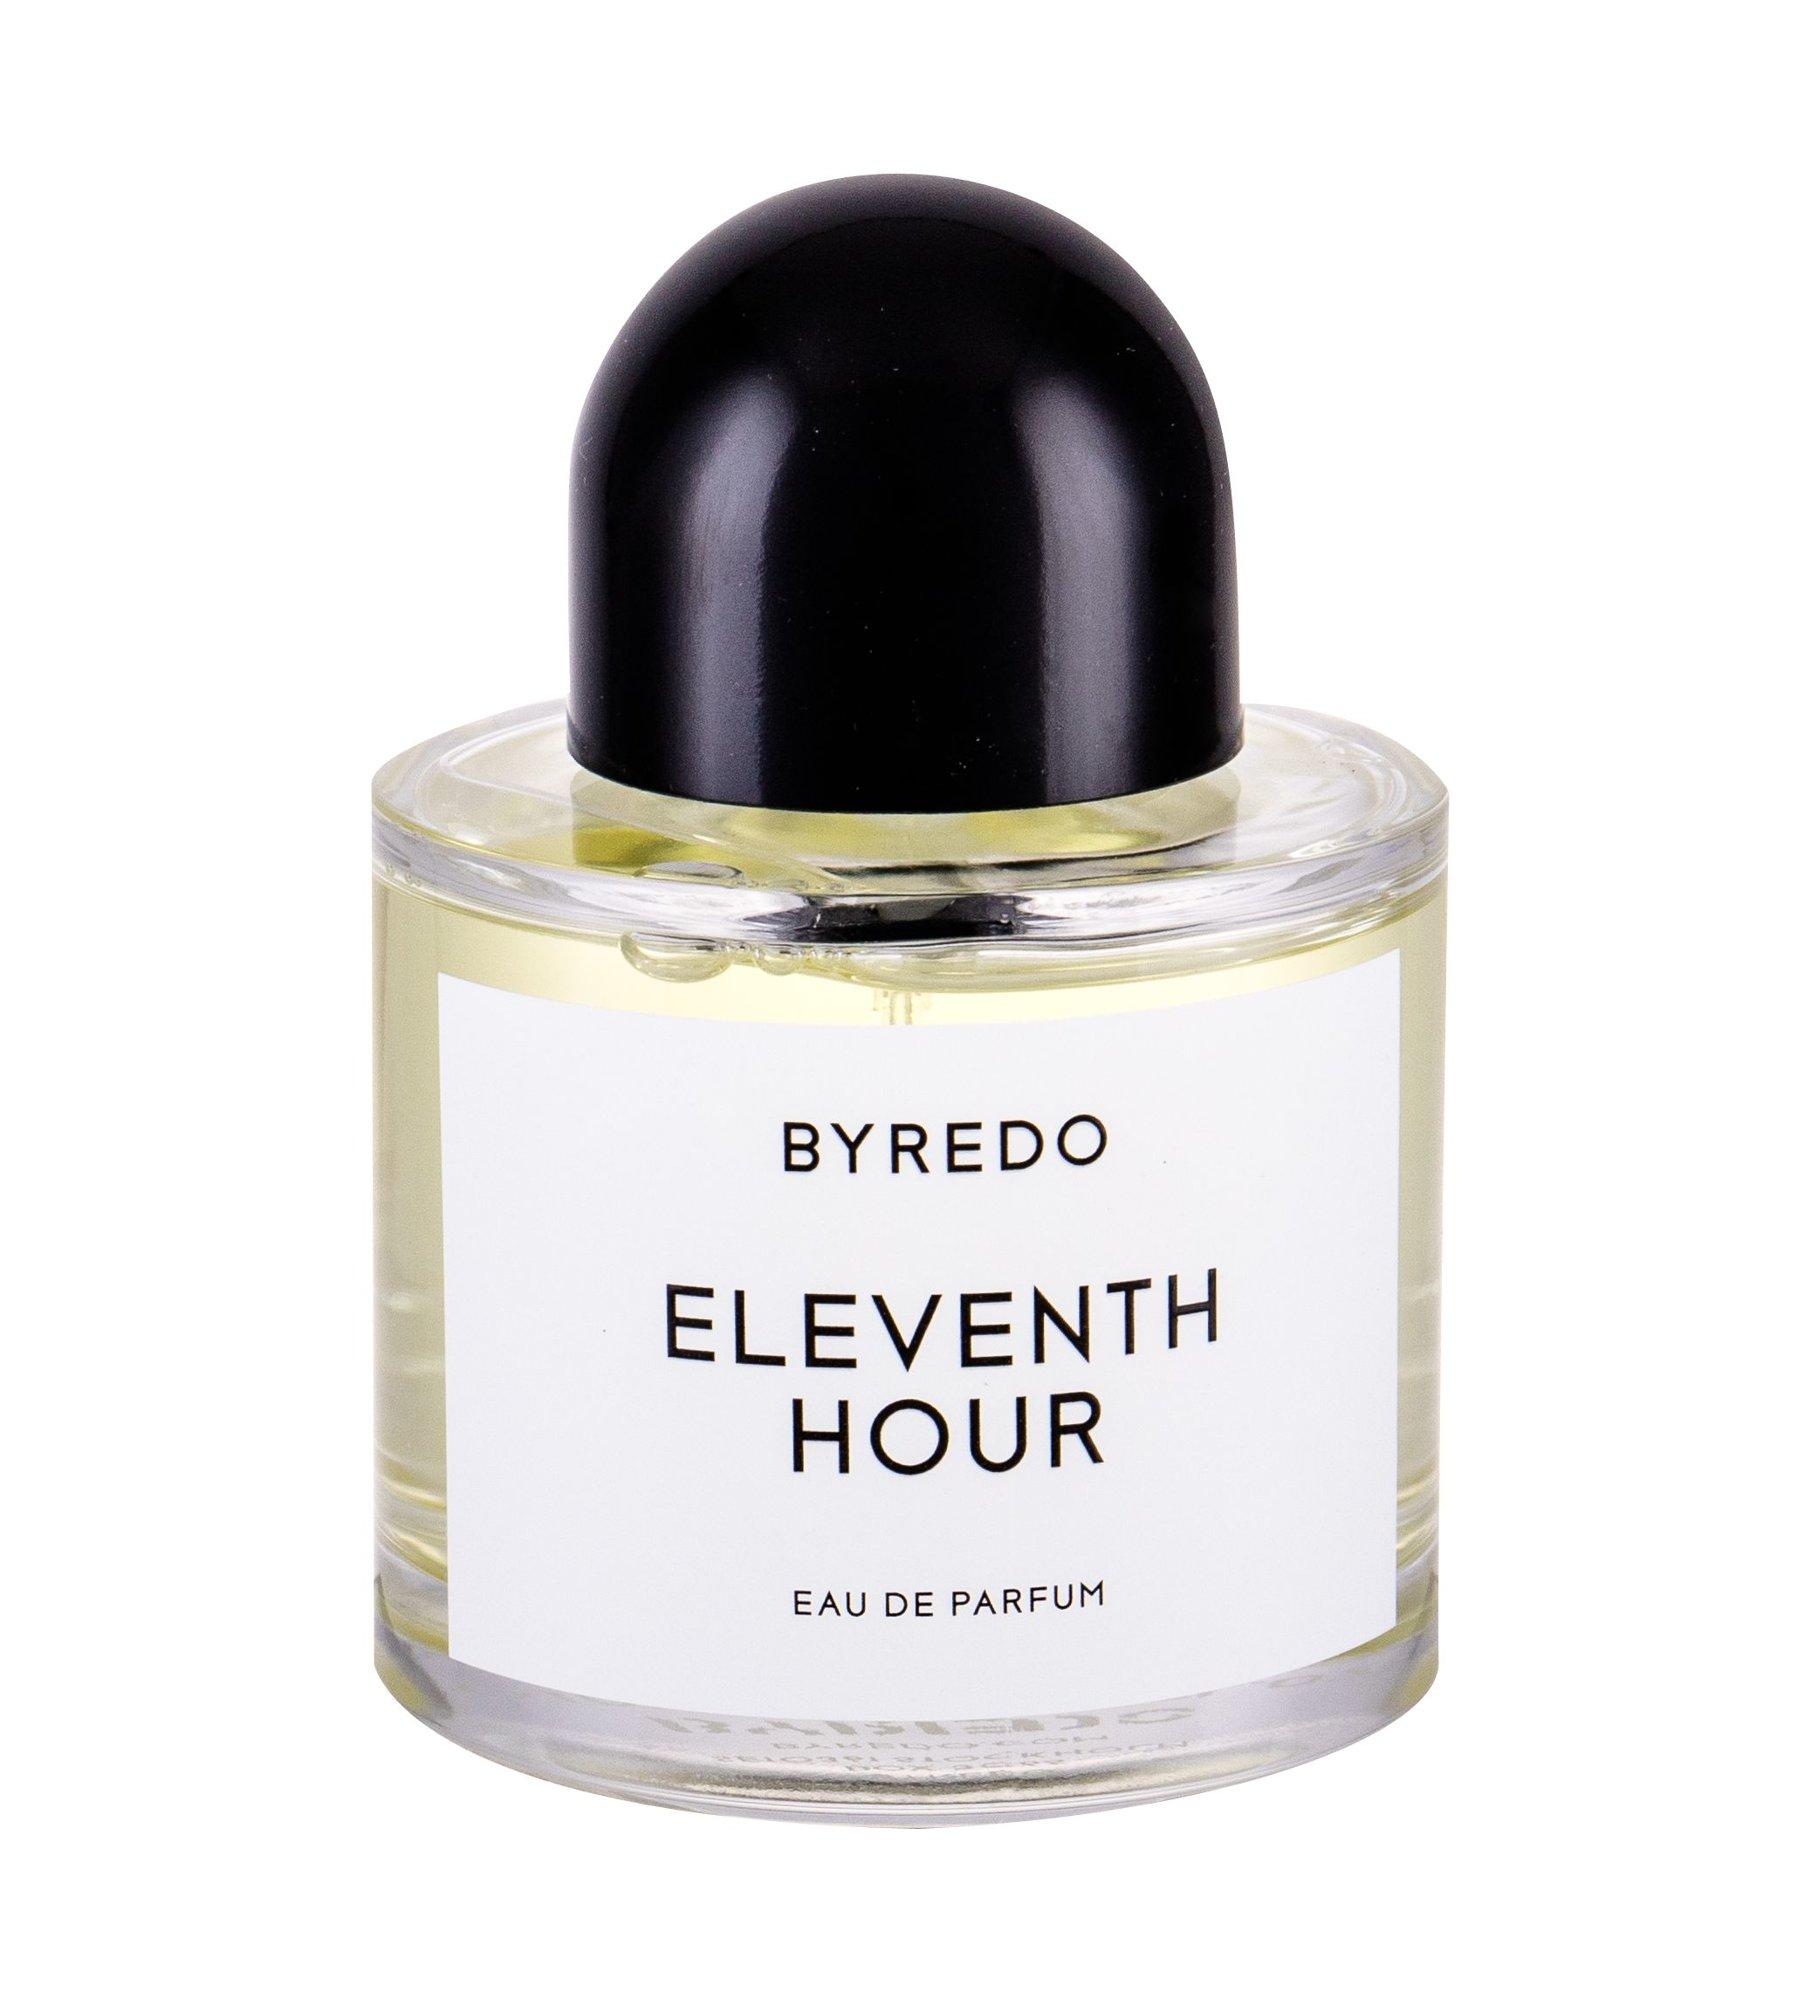 BYREDO Eleventh Hour, edp 50ml